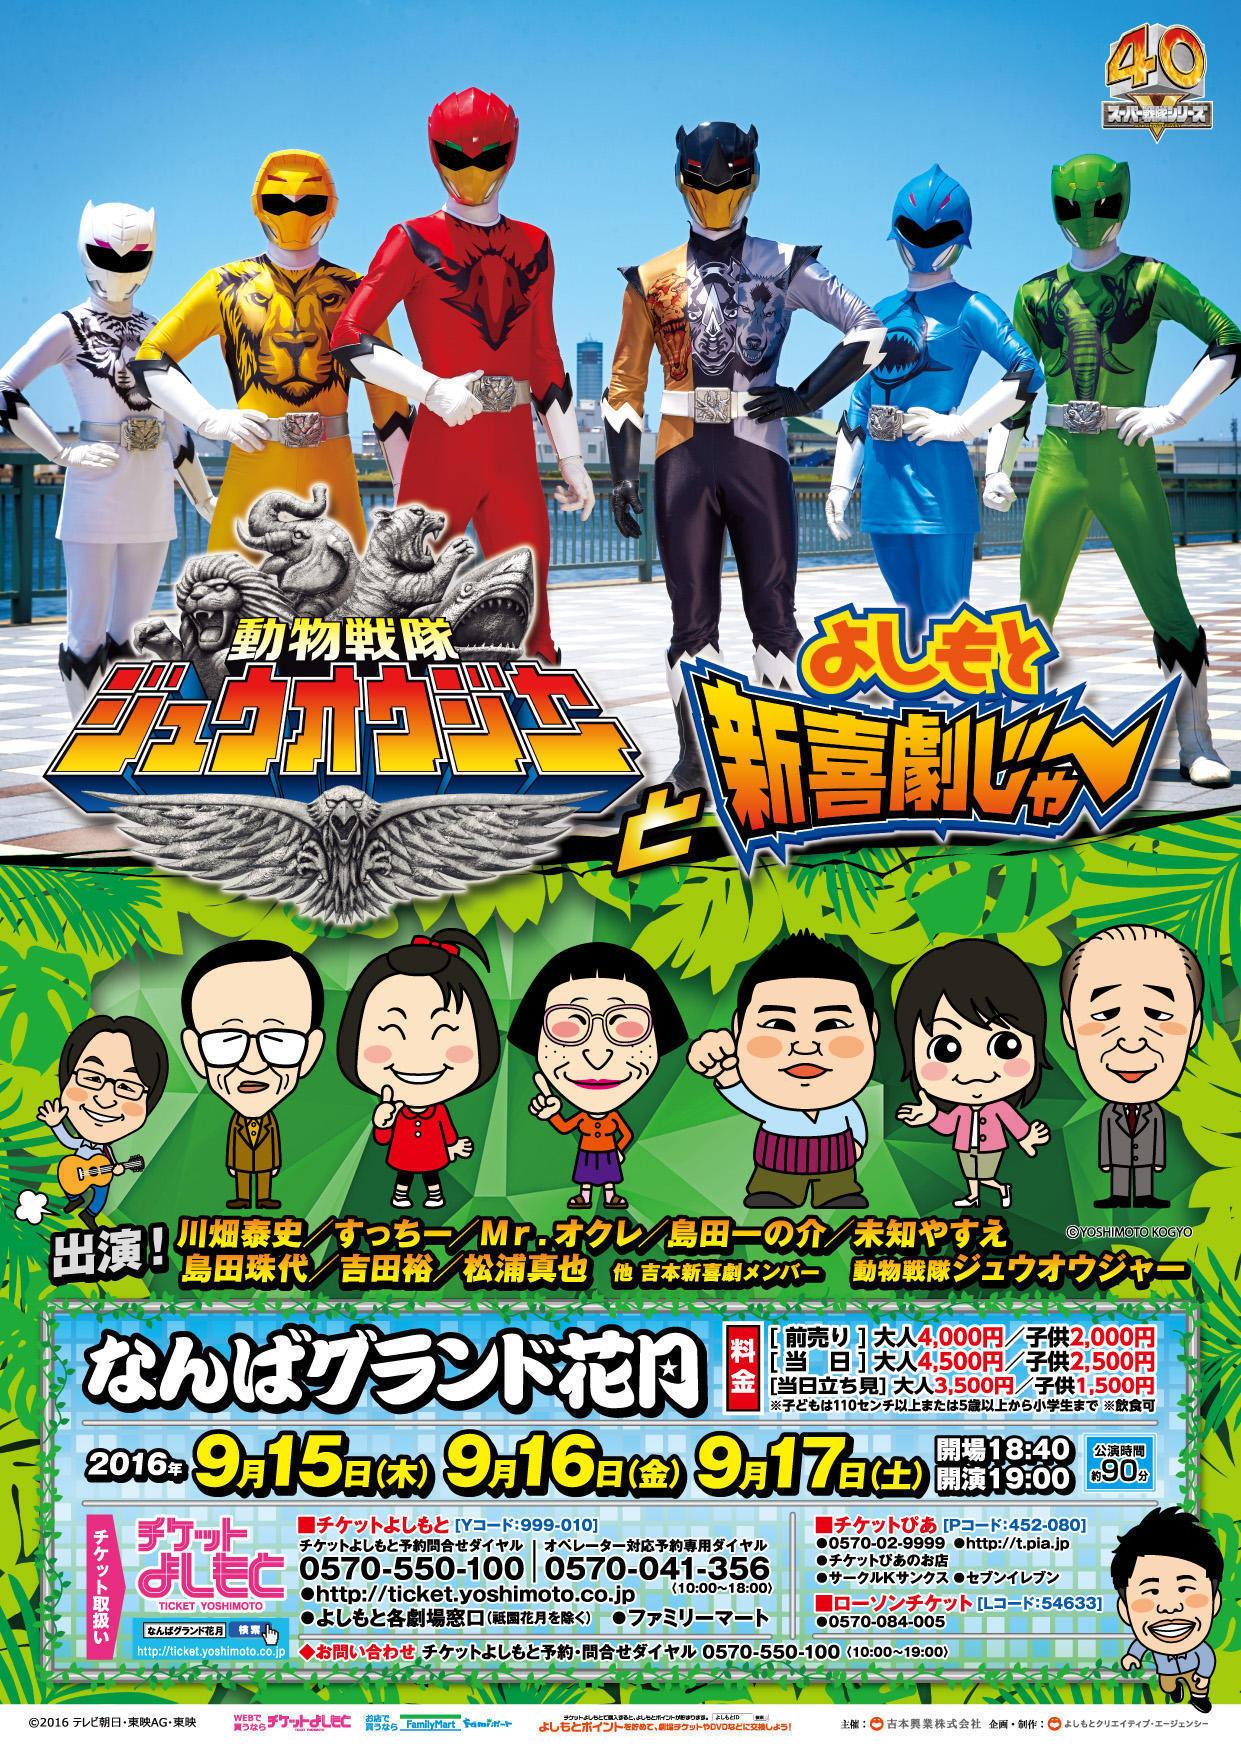 http://news.yoshimoto.co.jp/20160809114405-7dbabcb970f6753ede06a3e47e5996e4d6a7a373.jpg